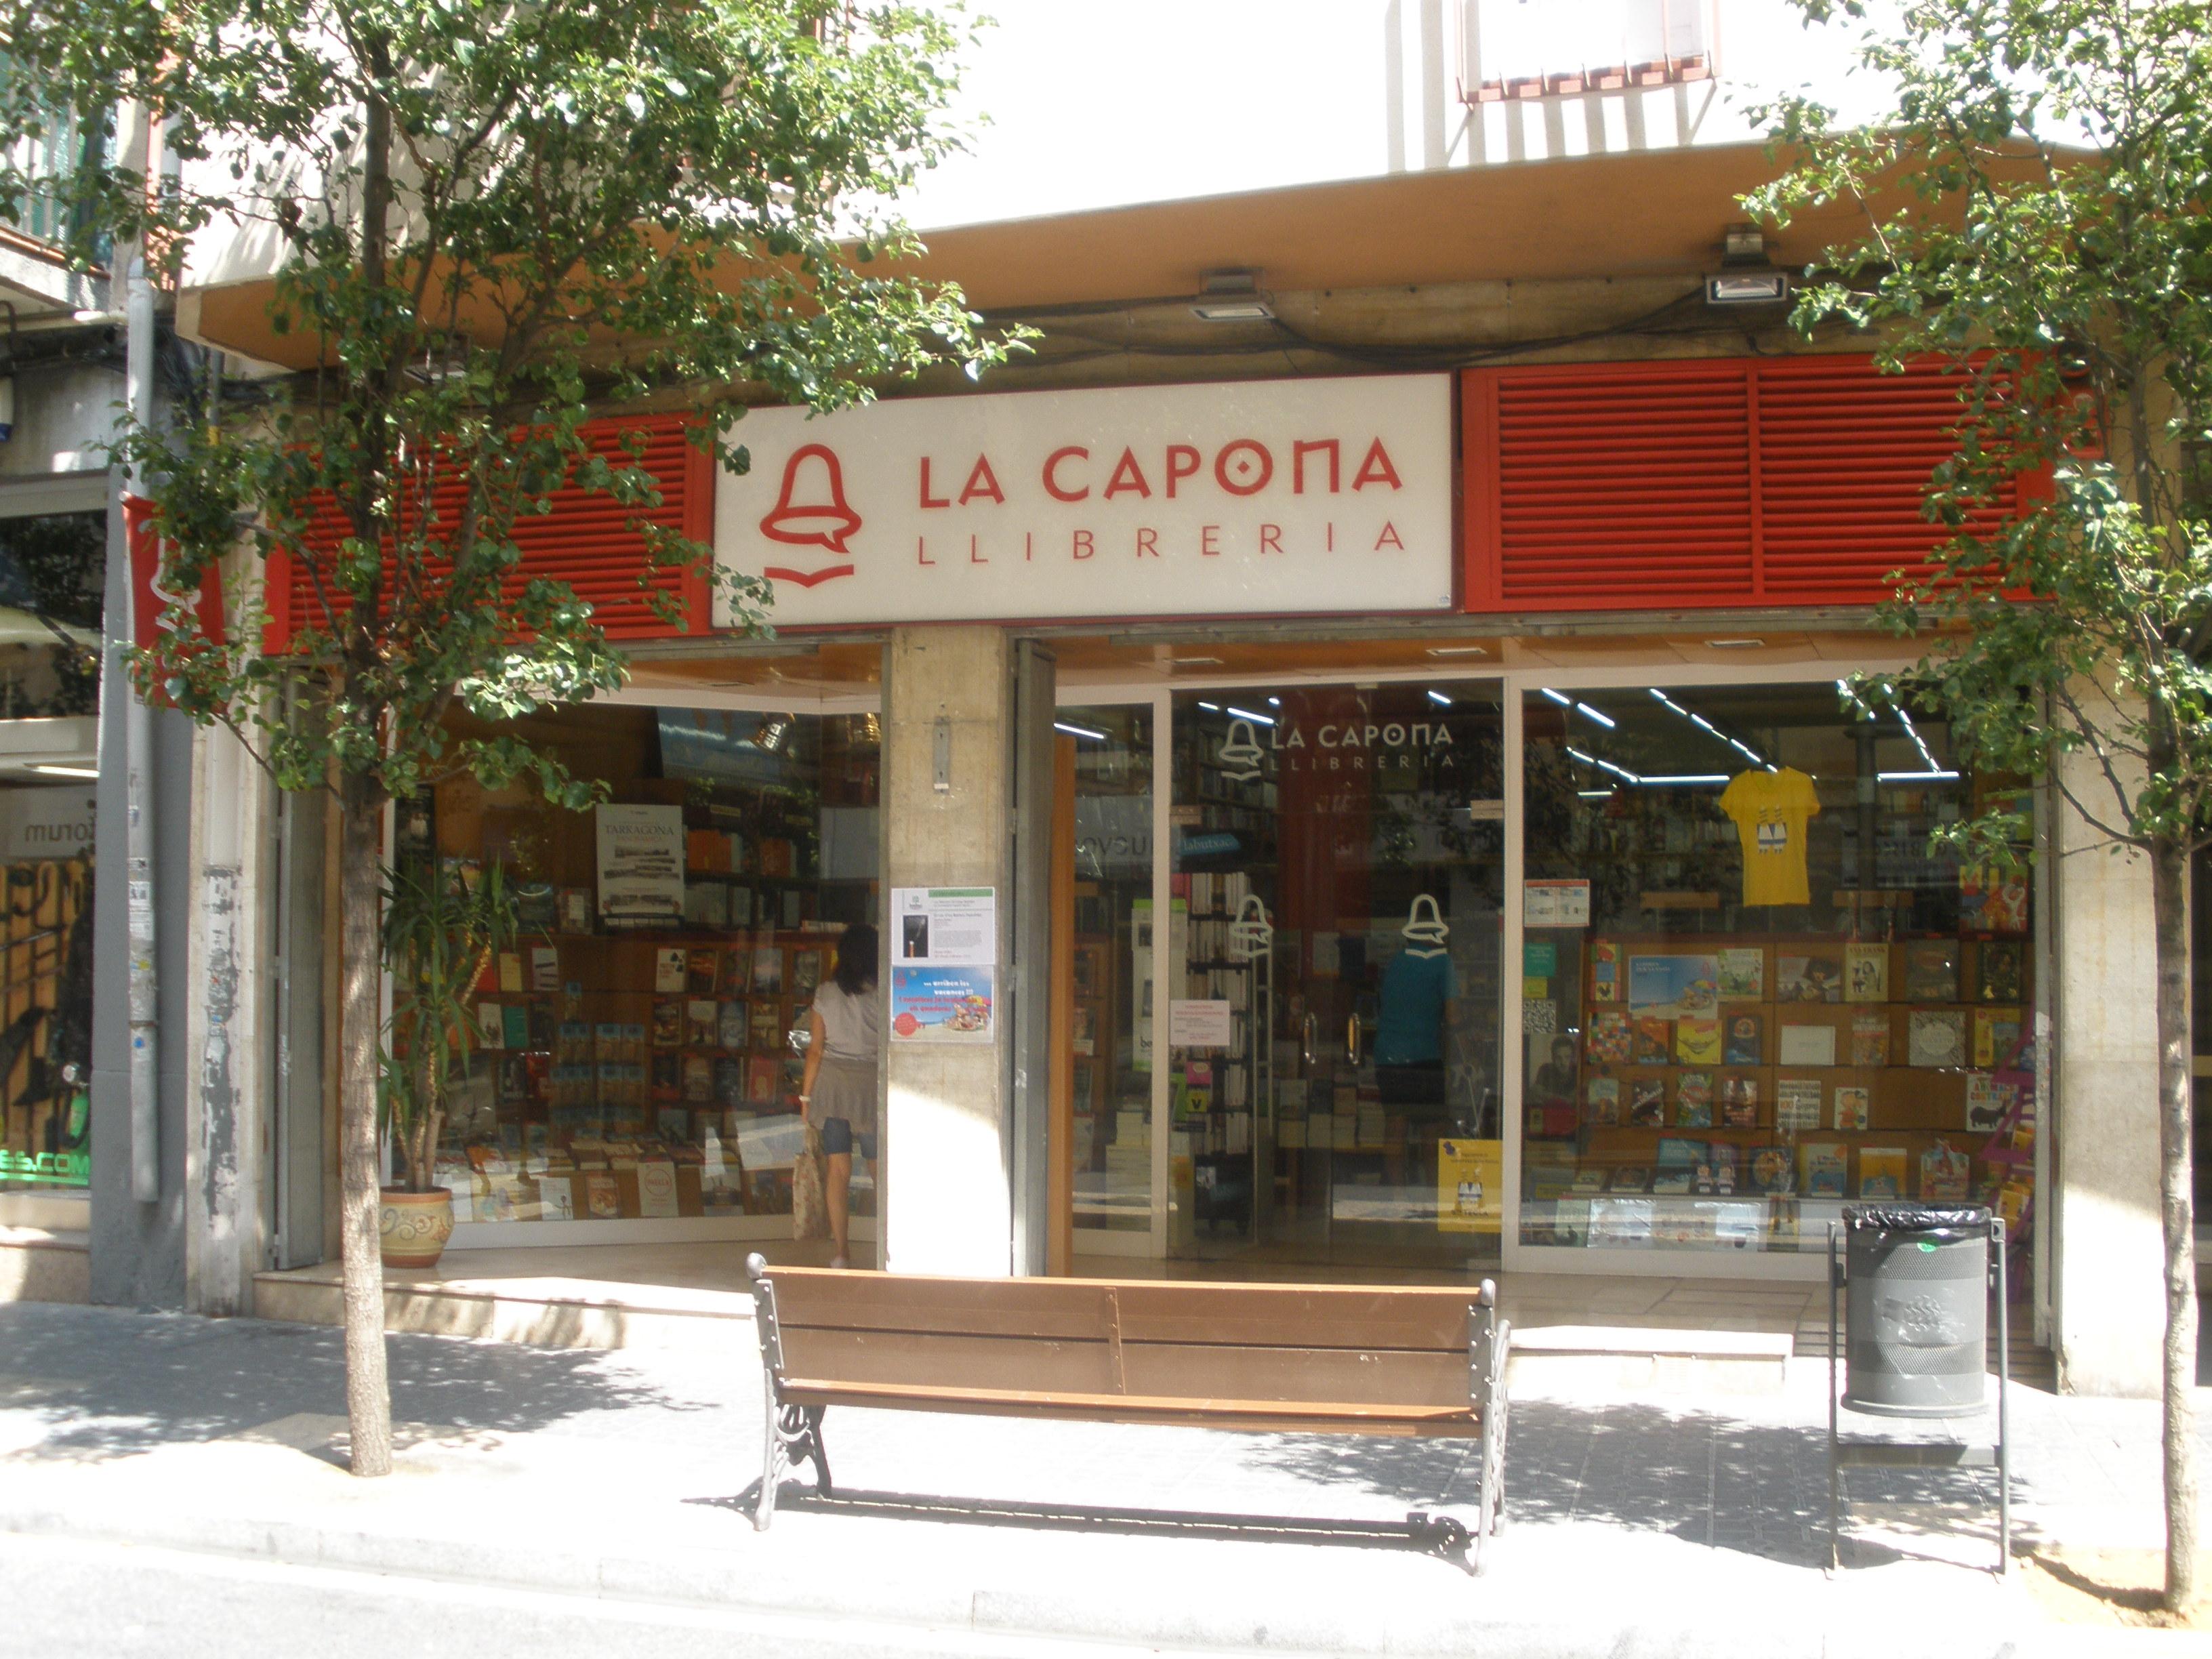 La Capona, al carrer Gasòmetre.